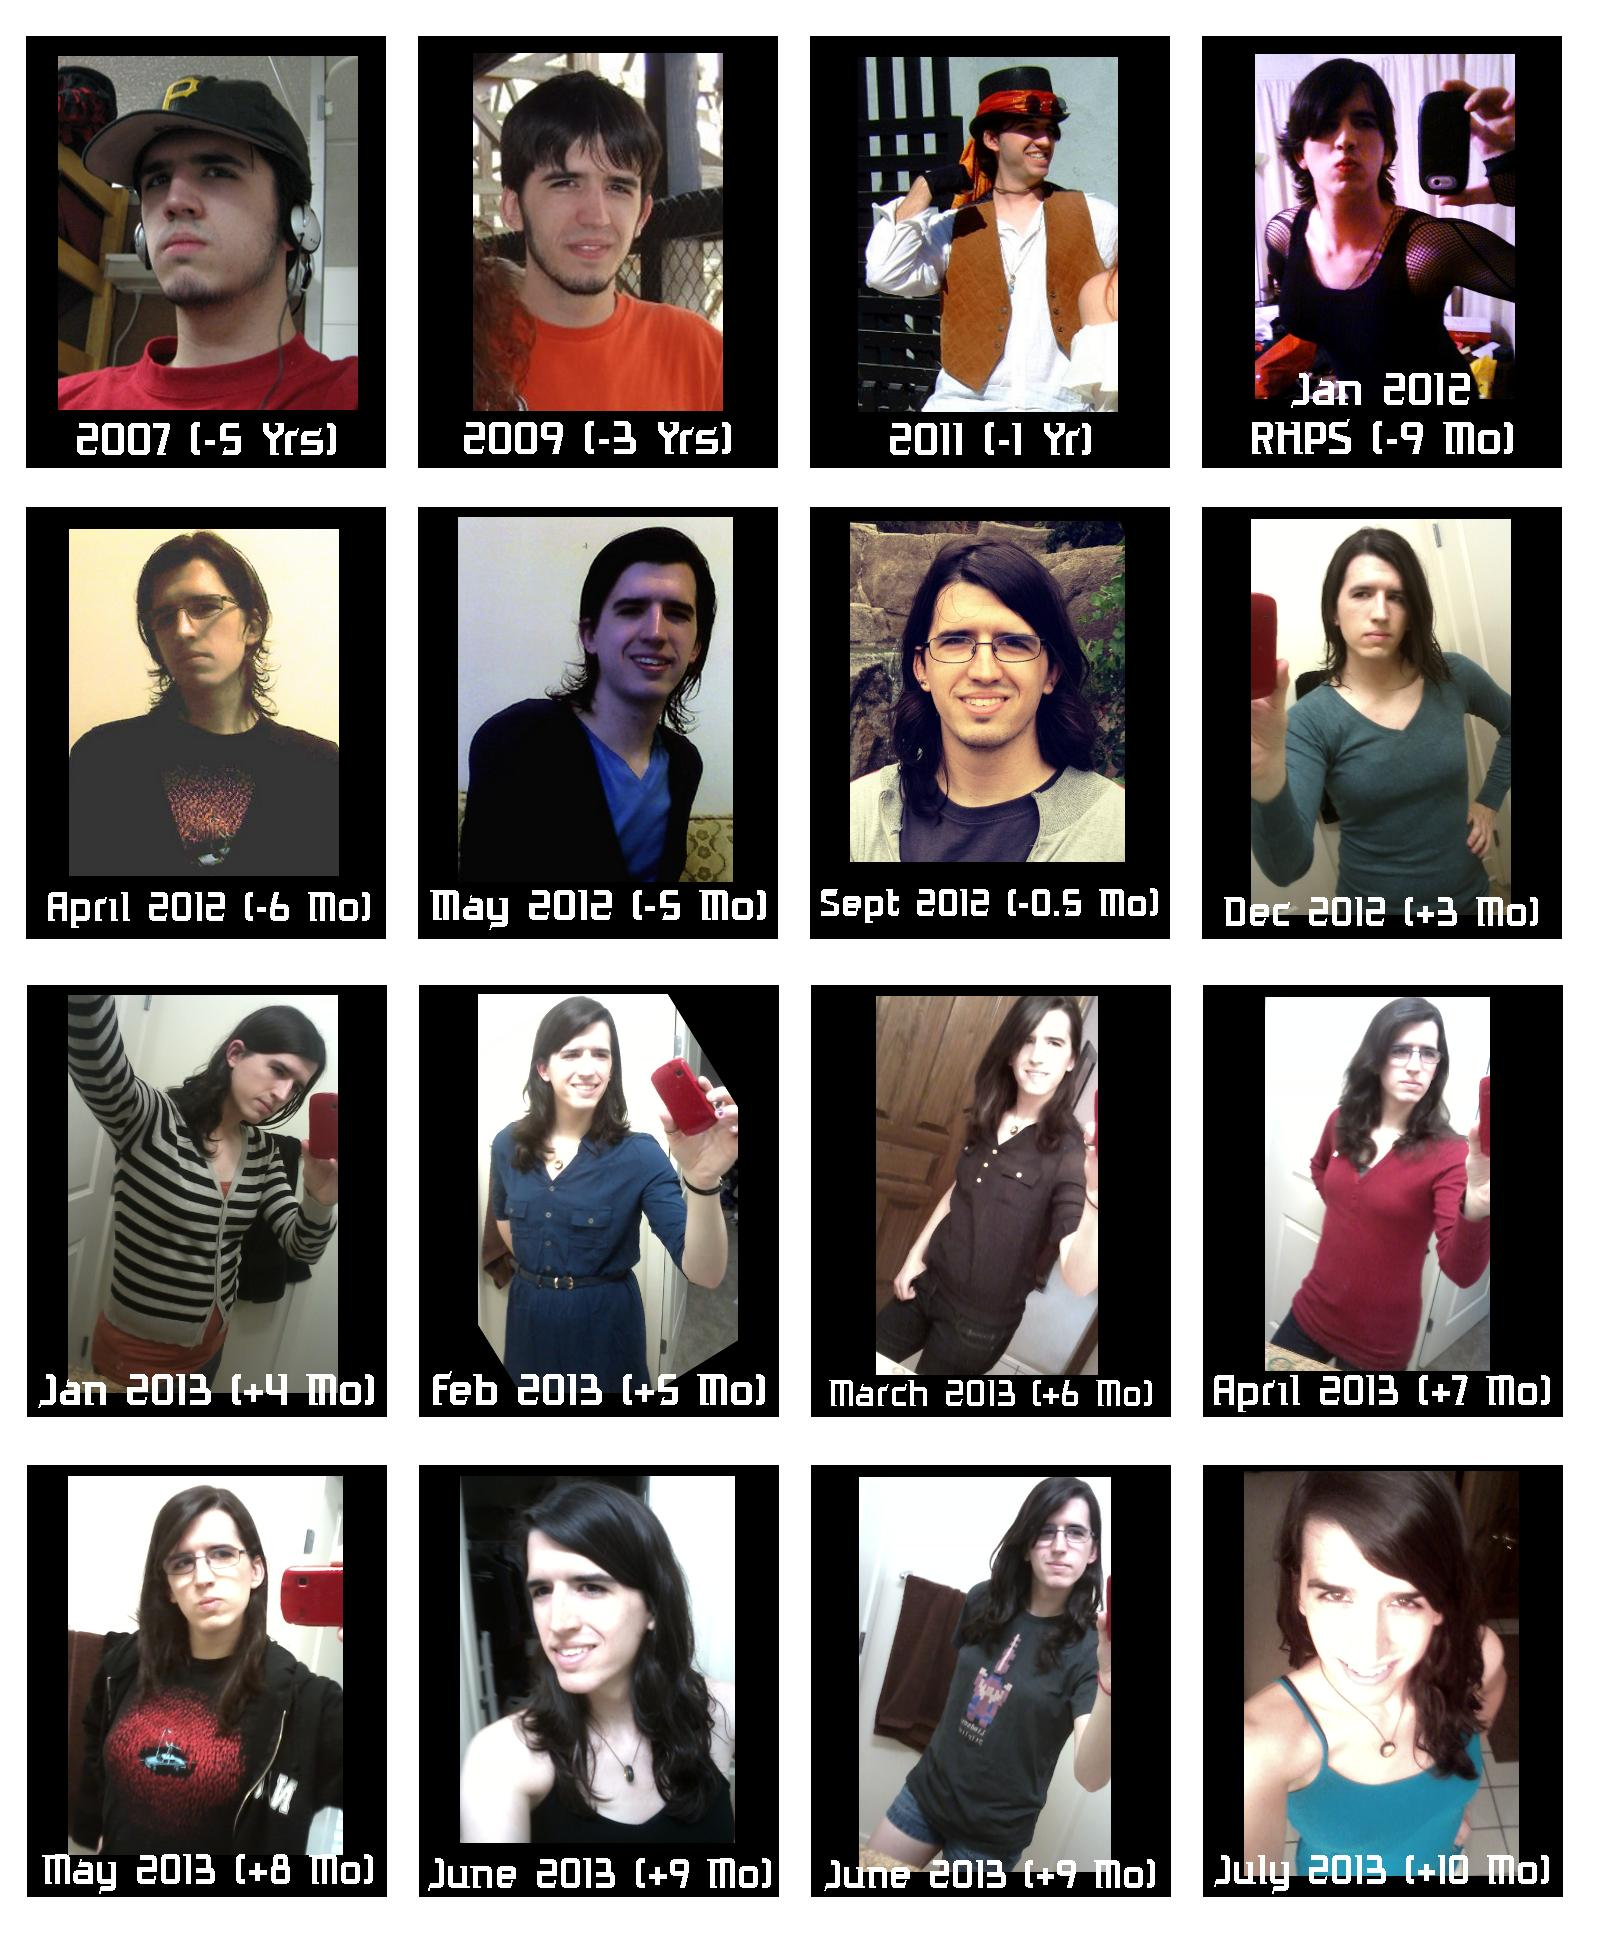 Mtf transsexual hrt timeline